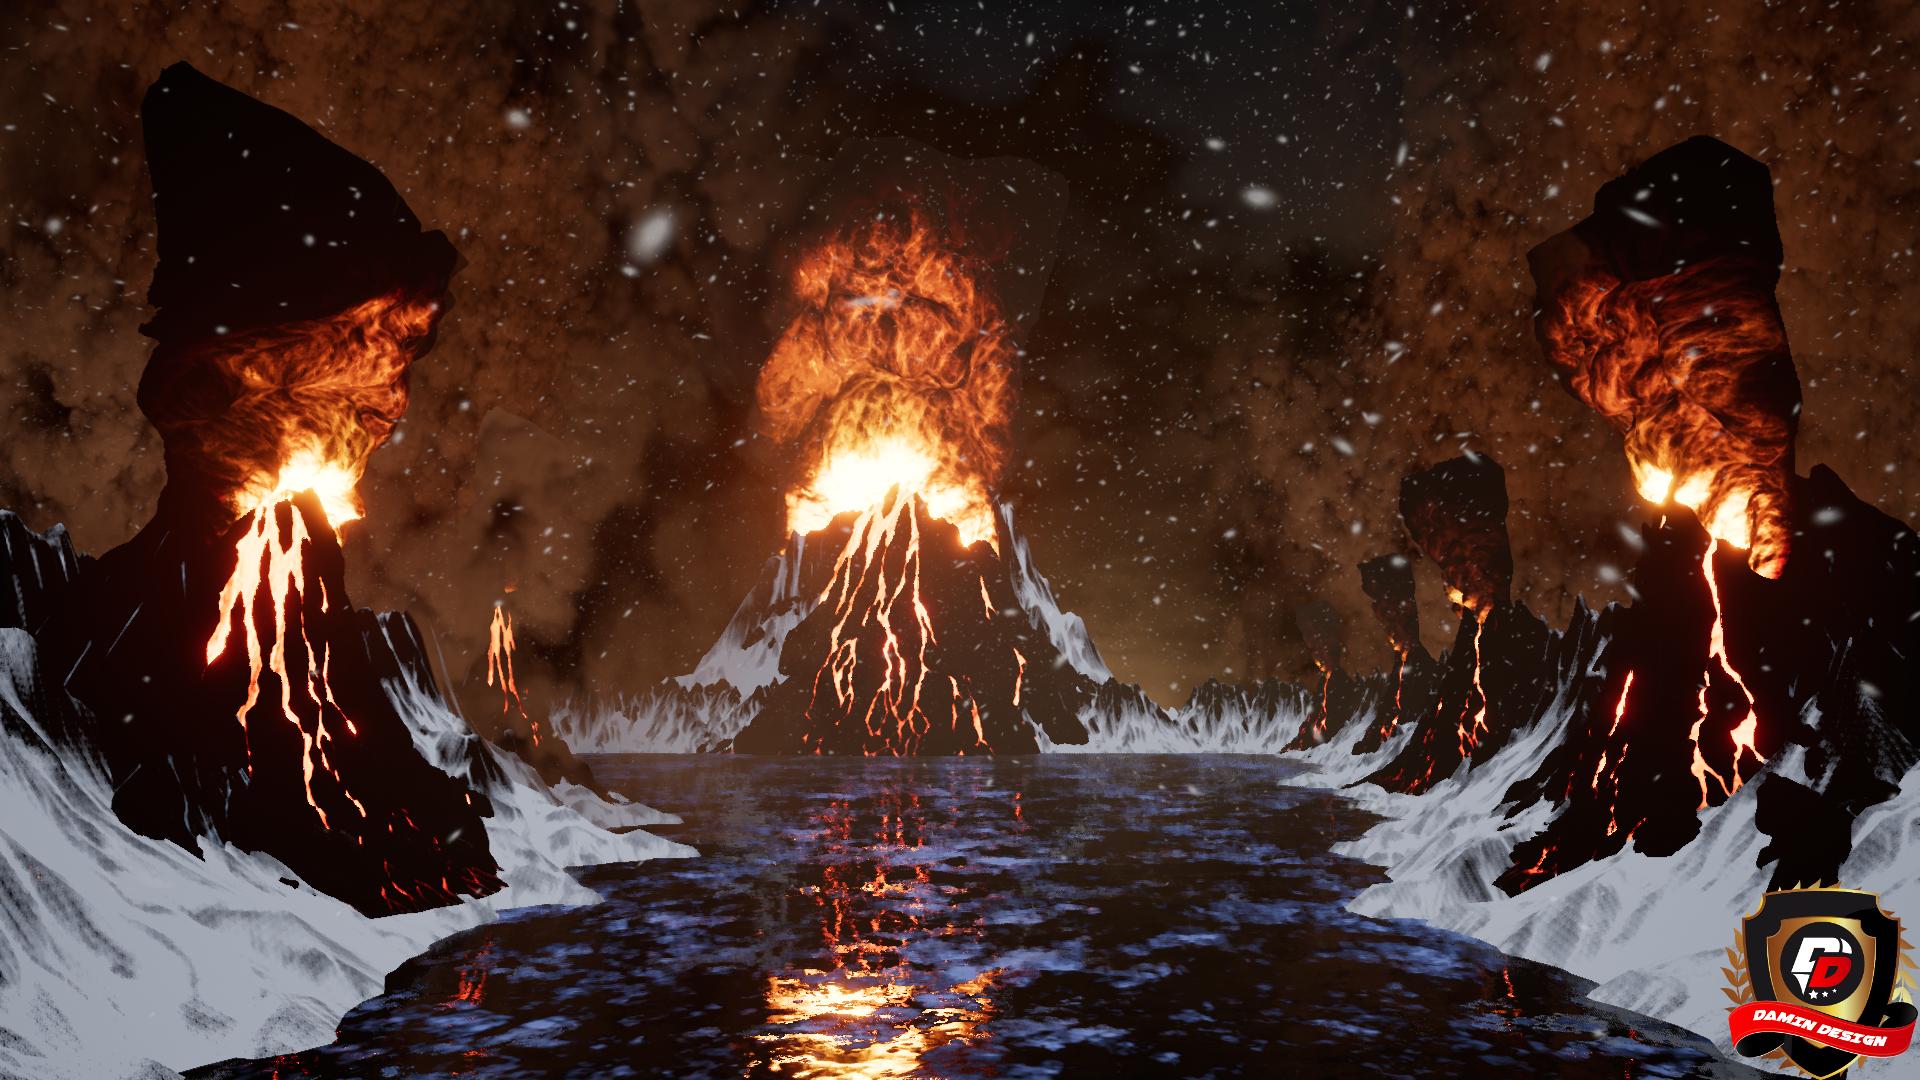 Unreal Engine 4 Volcano Eruption by DaminDesign